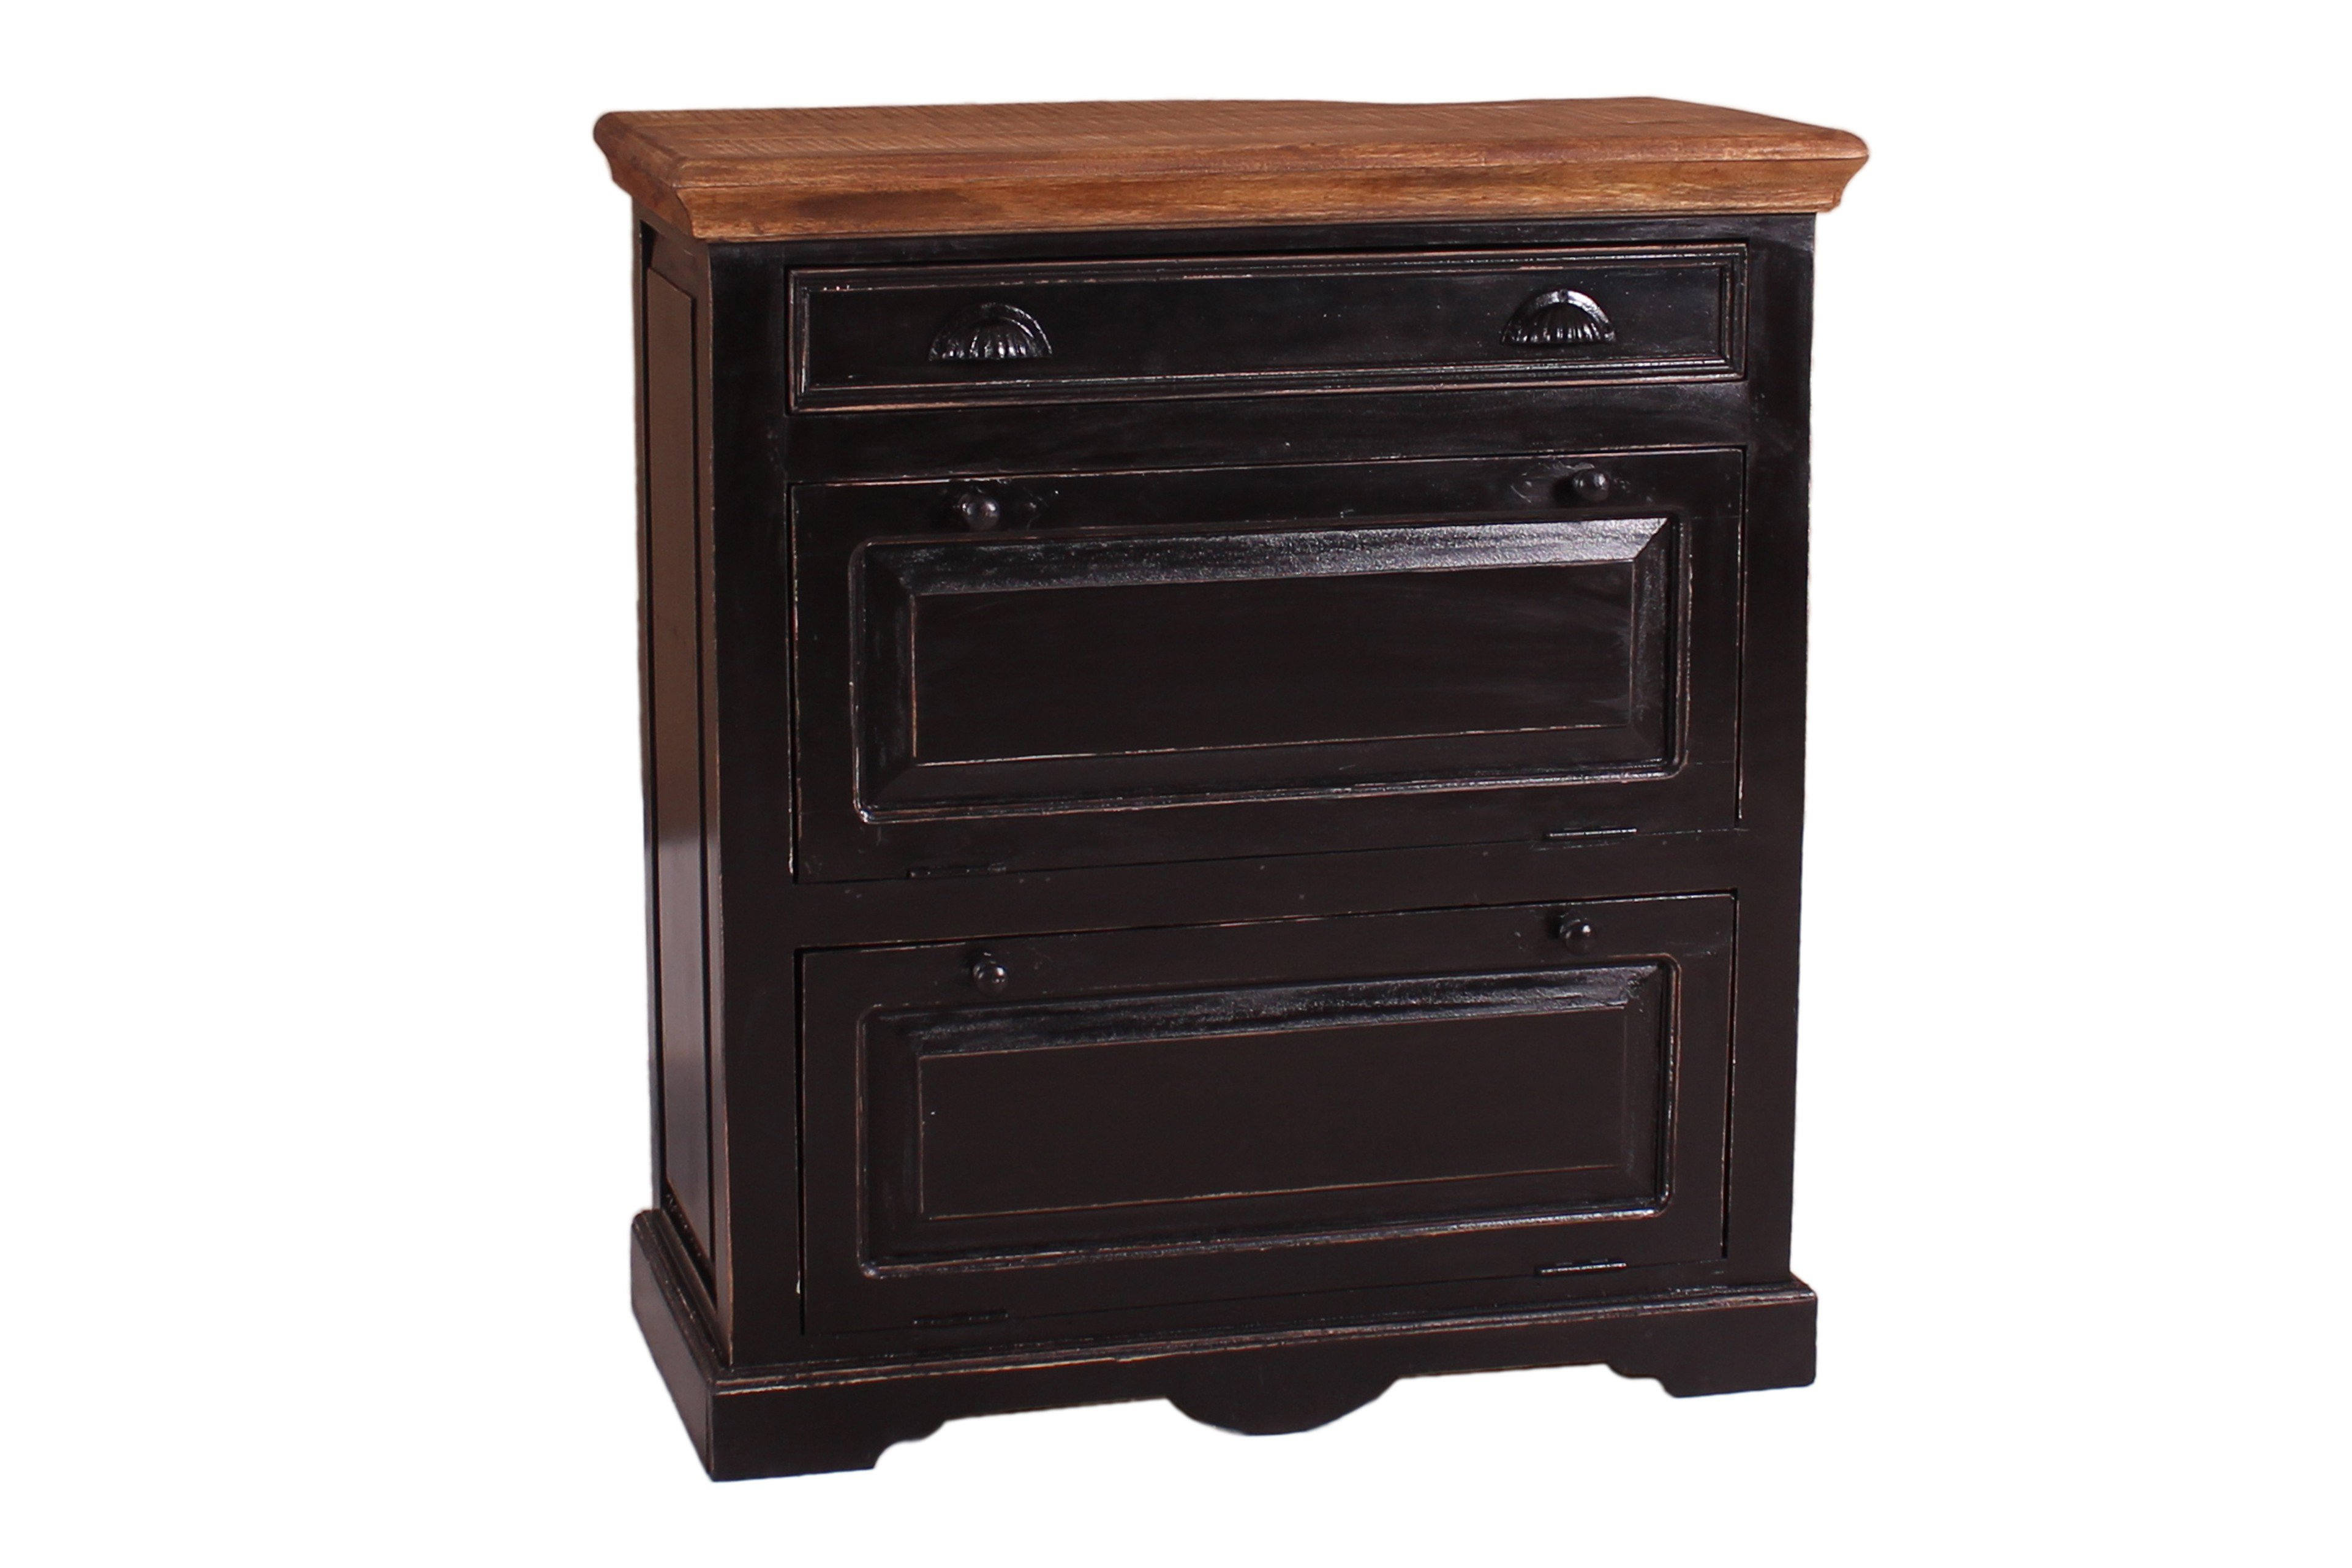 sit m bel schuhschrank corsica schwarz m bel letz ihr online shop. Black Bedroom Furniture Sets. Home Design Ideas